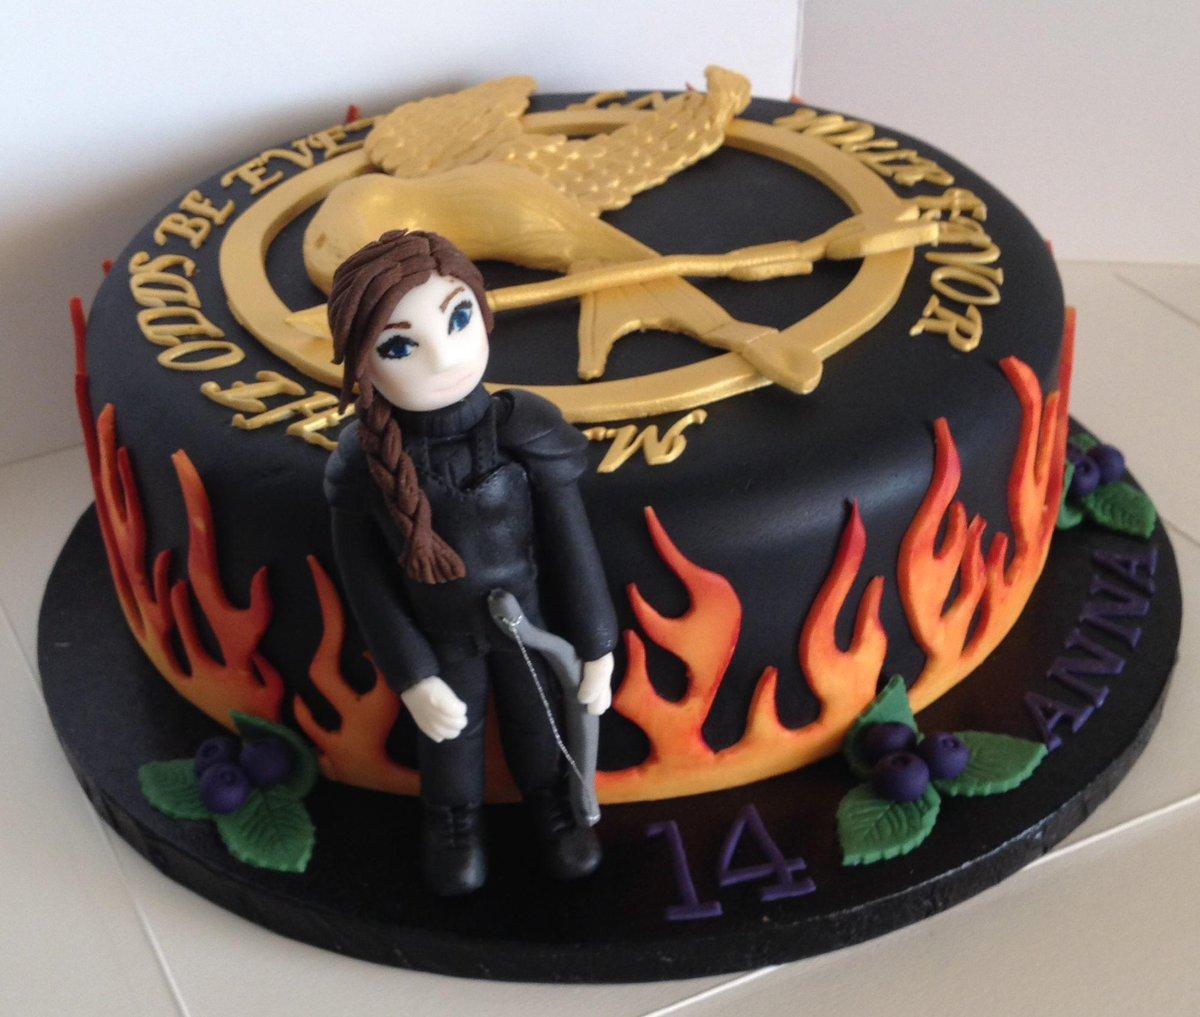 Pleasing Cake Rocks On Twitter Hunger Games Cake Hungergames Cake Funny Birthday Cards Online Elaedamsfinfo